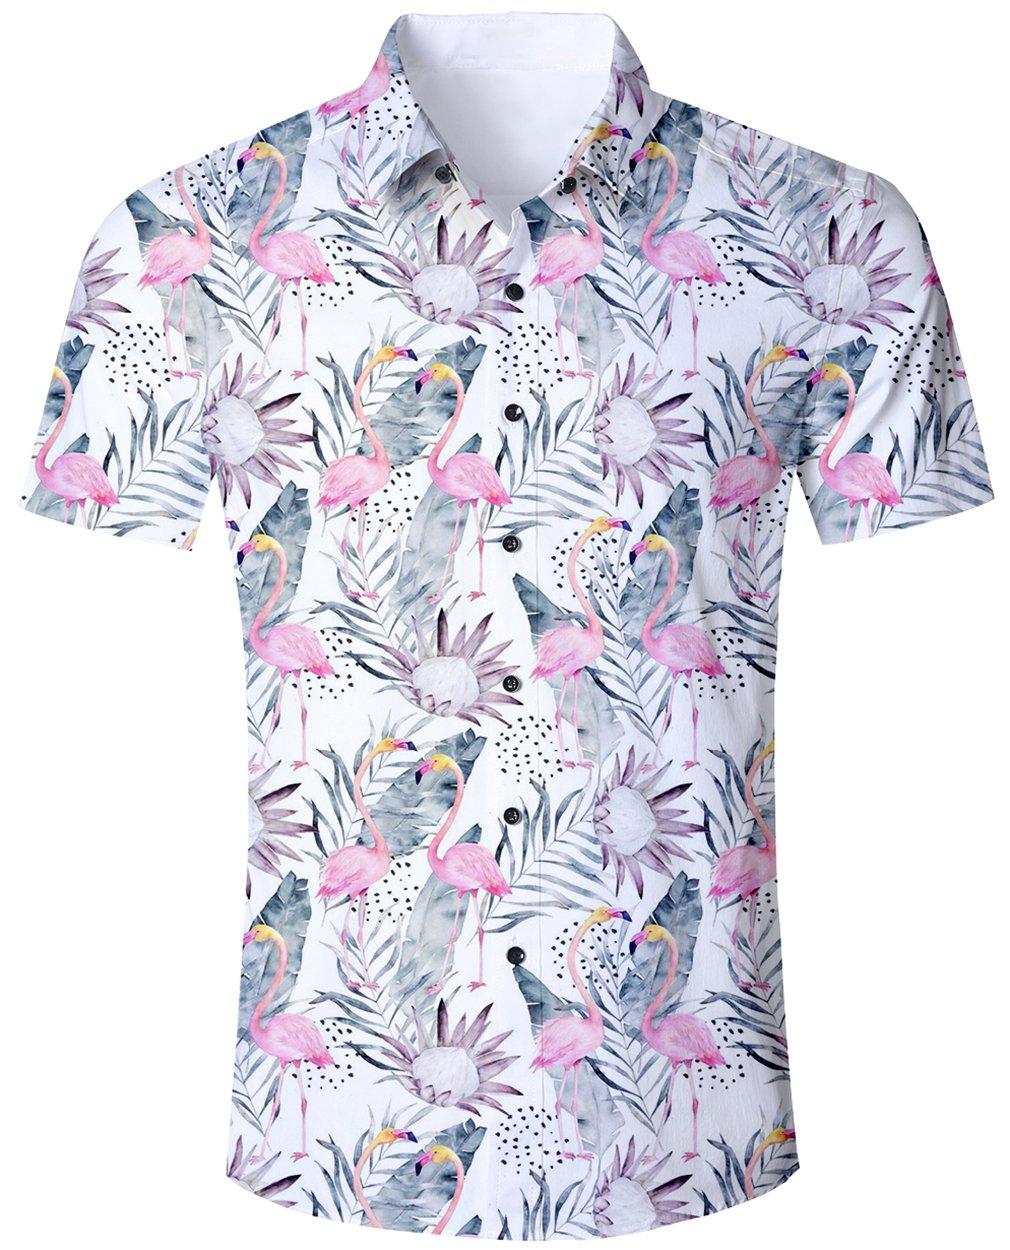 flamingo shirt amazon co ukgoodstoworld mens casual shirts funky 3d printed short sleeve colourful hawaiian shirts s xl